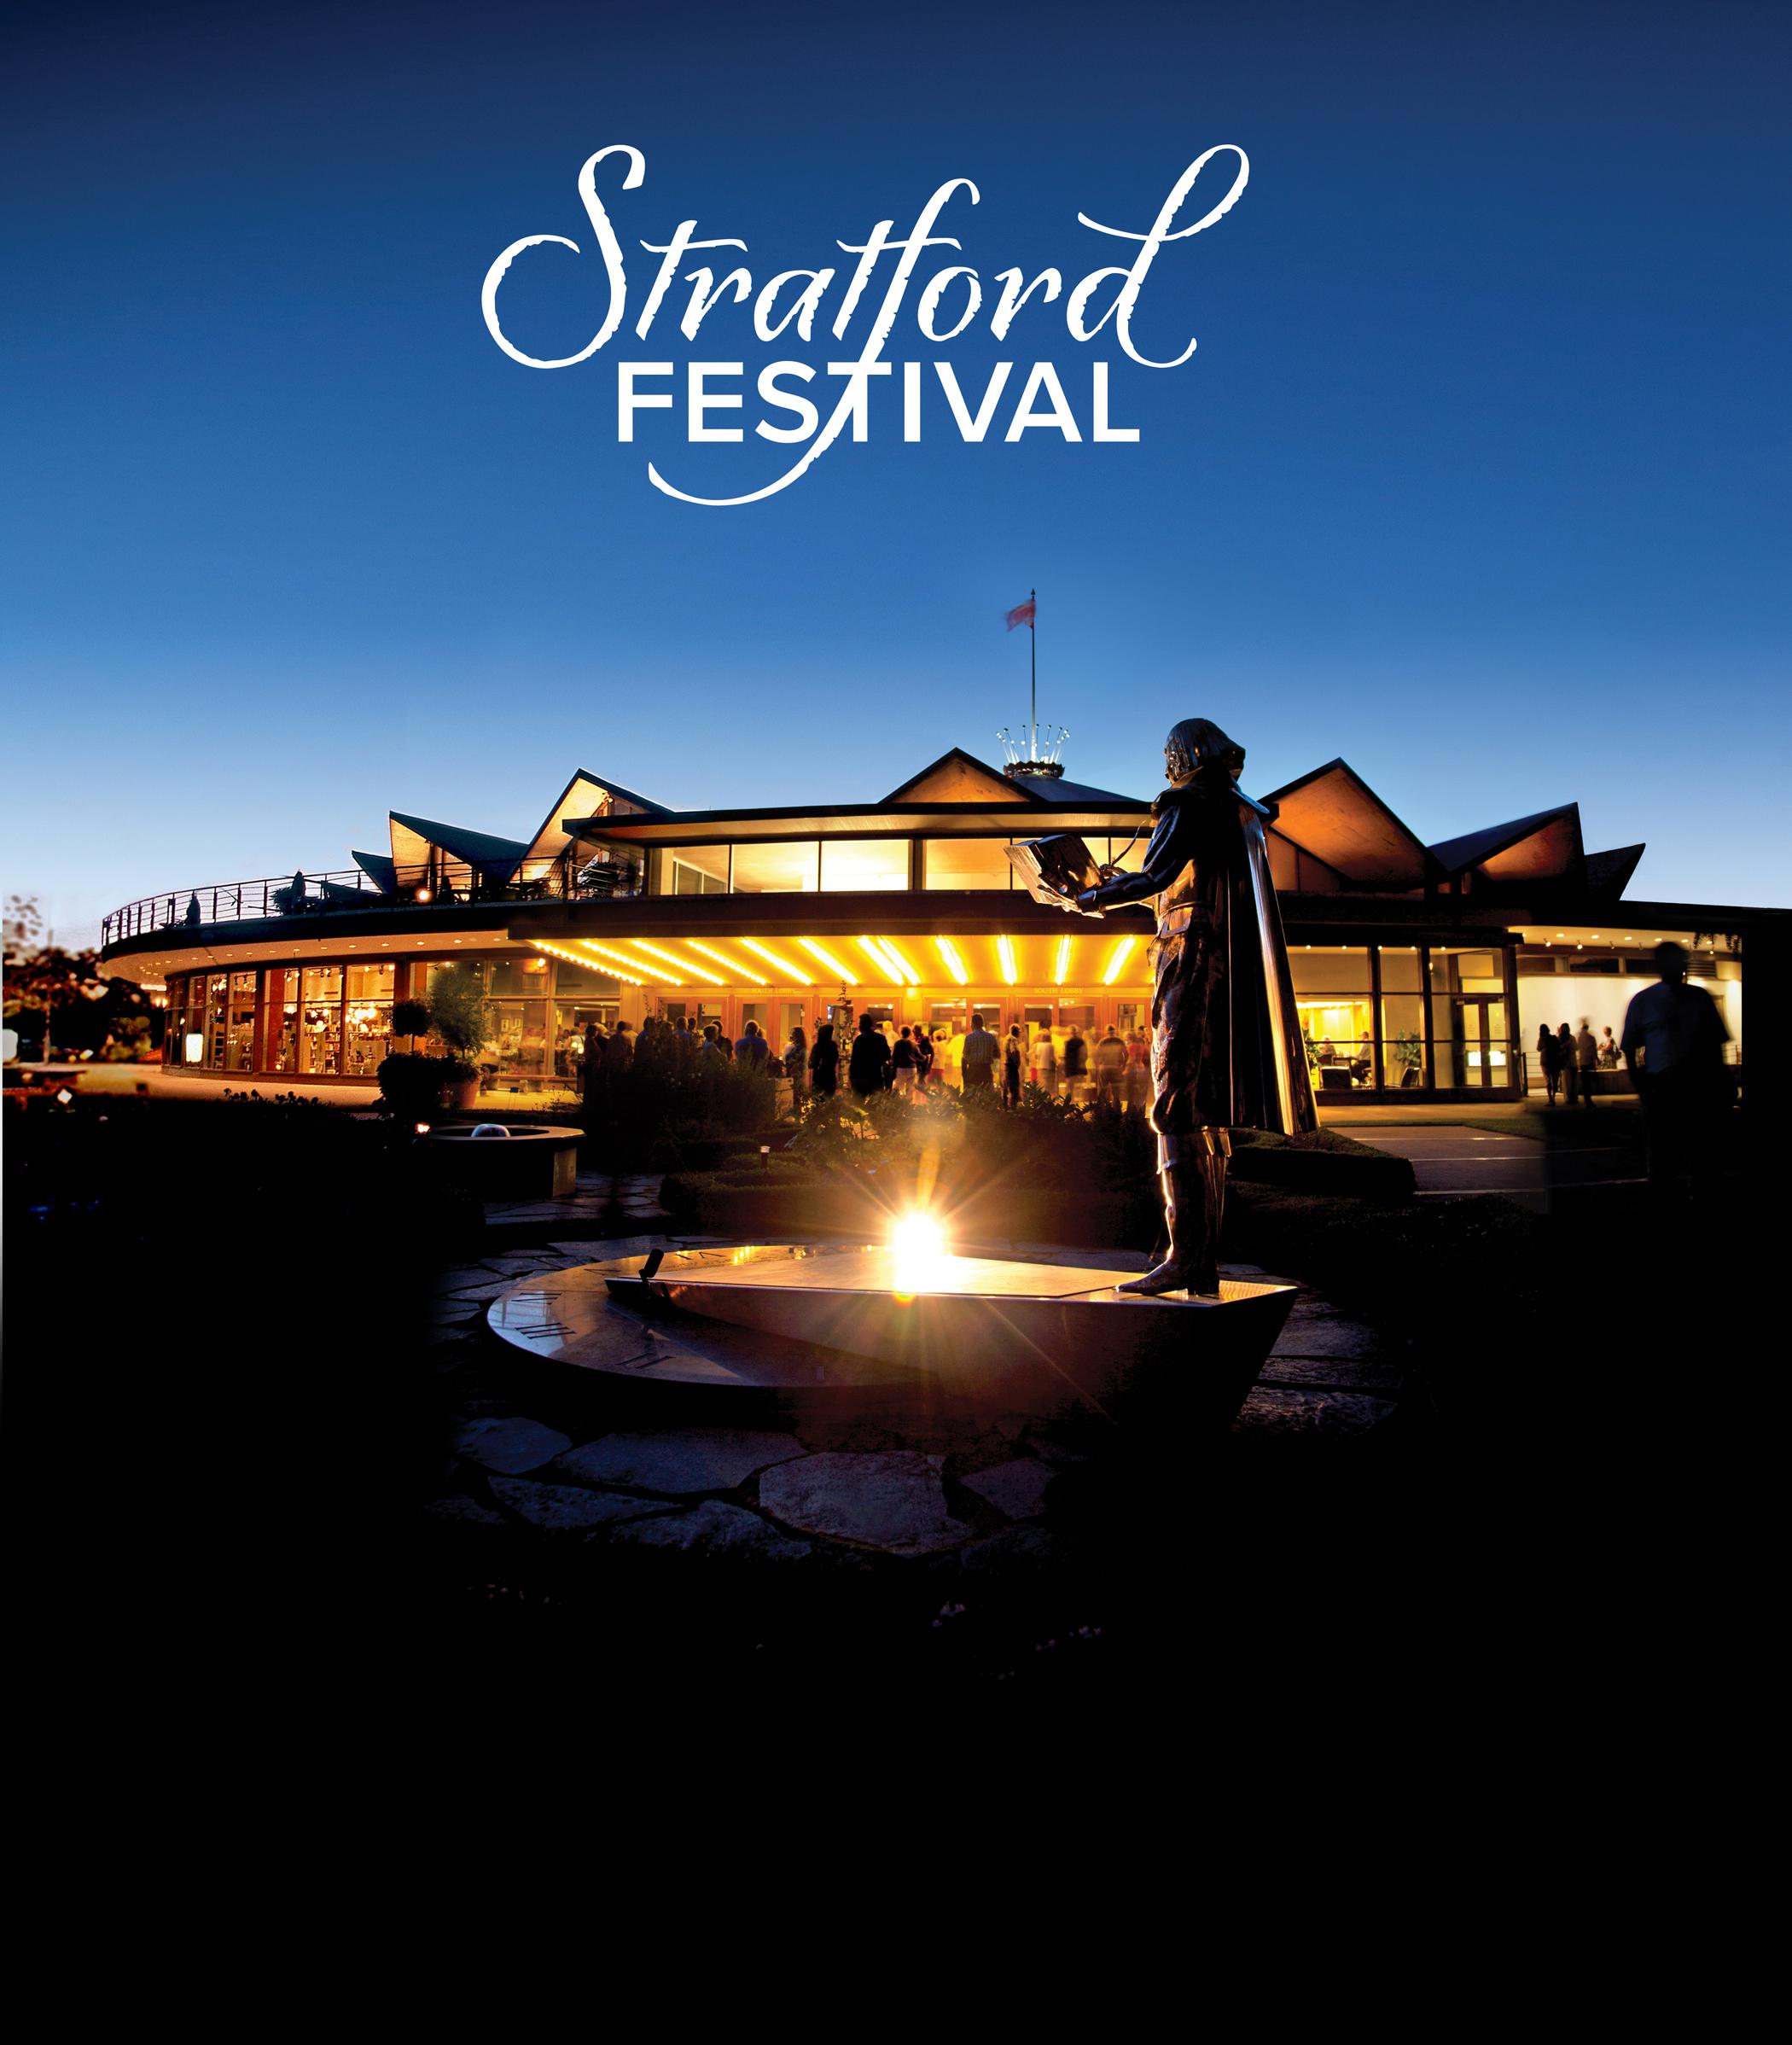 Stratford Festival 2020.Stratford Festival Releases 2020 Schedule 105 7 Strathroy